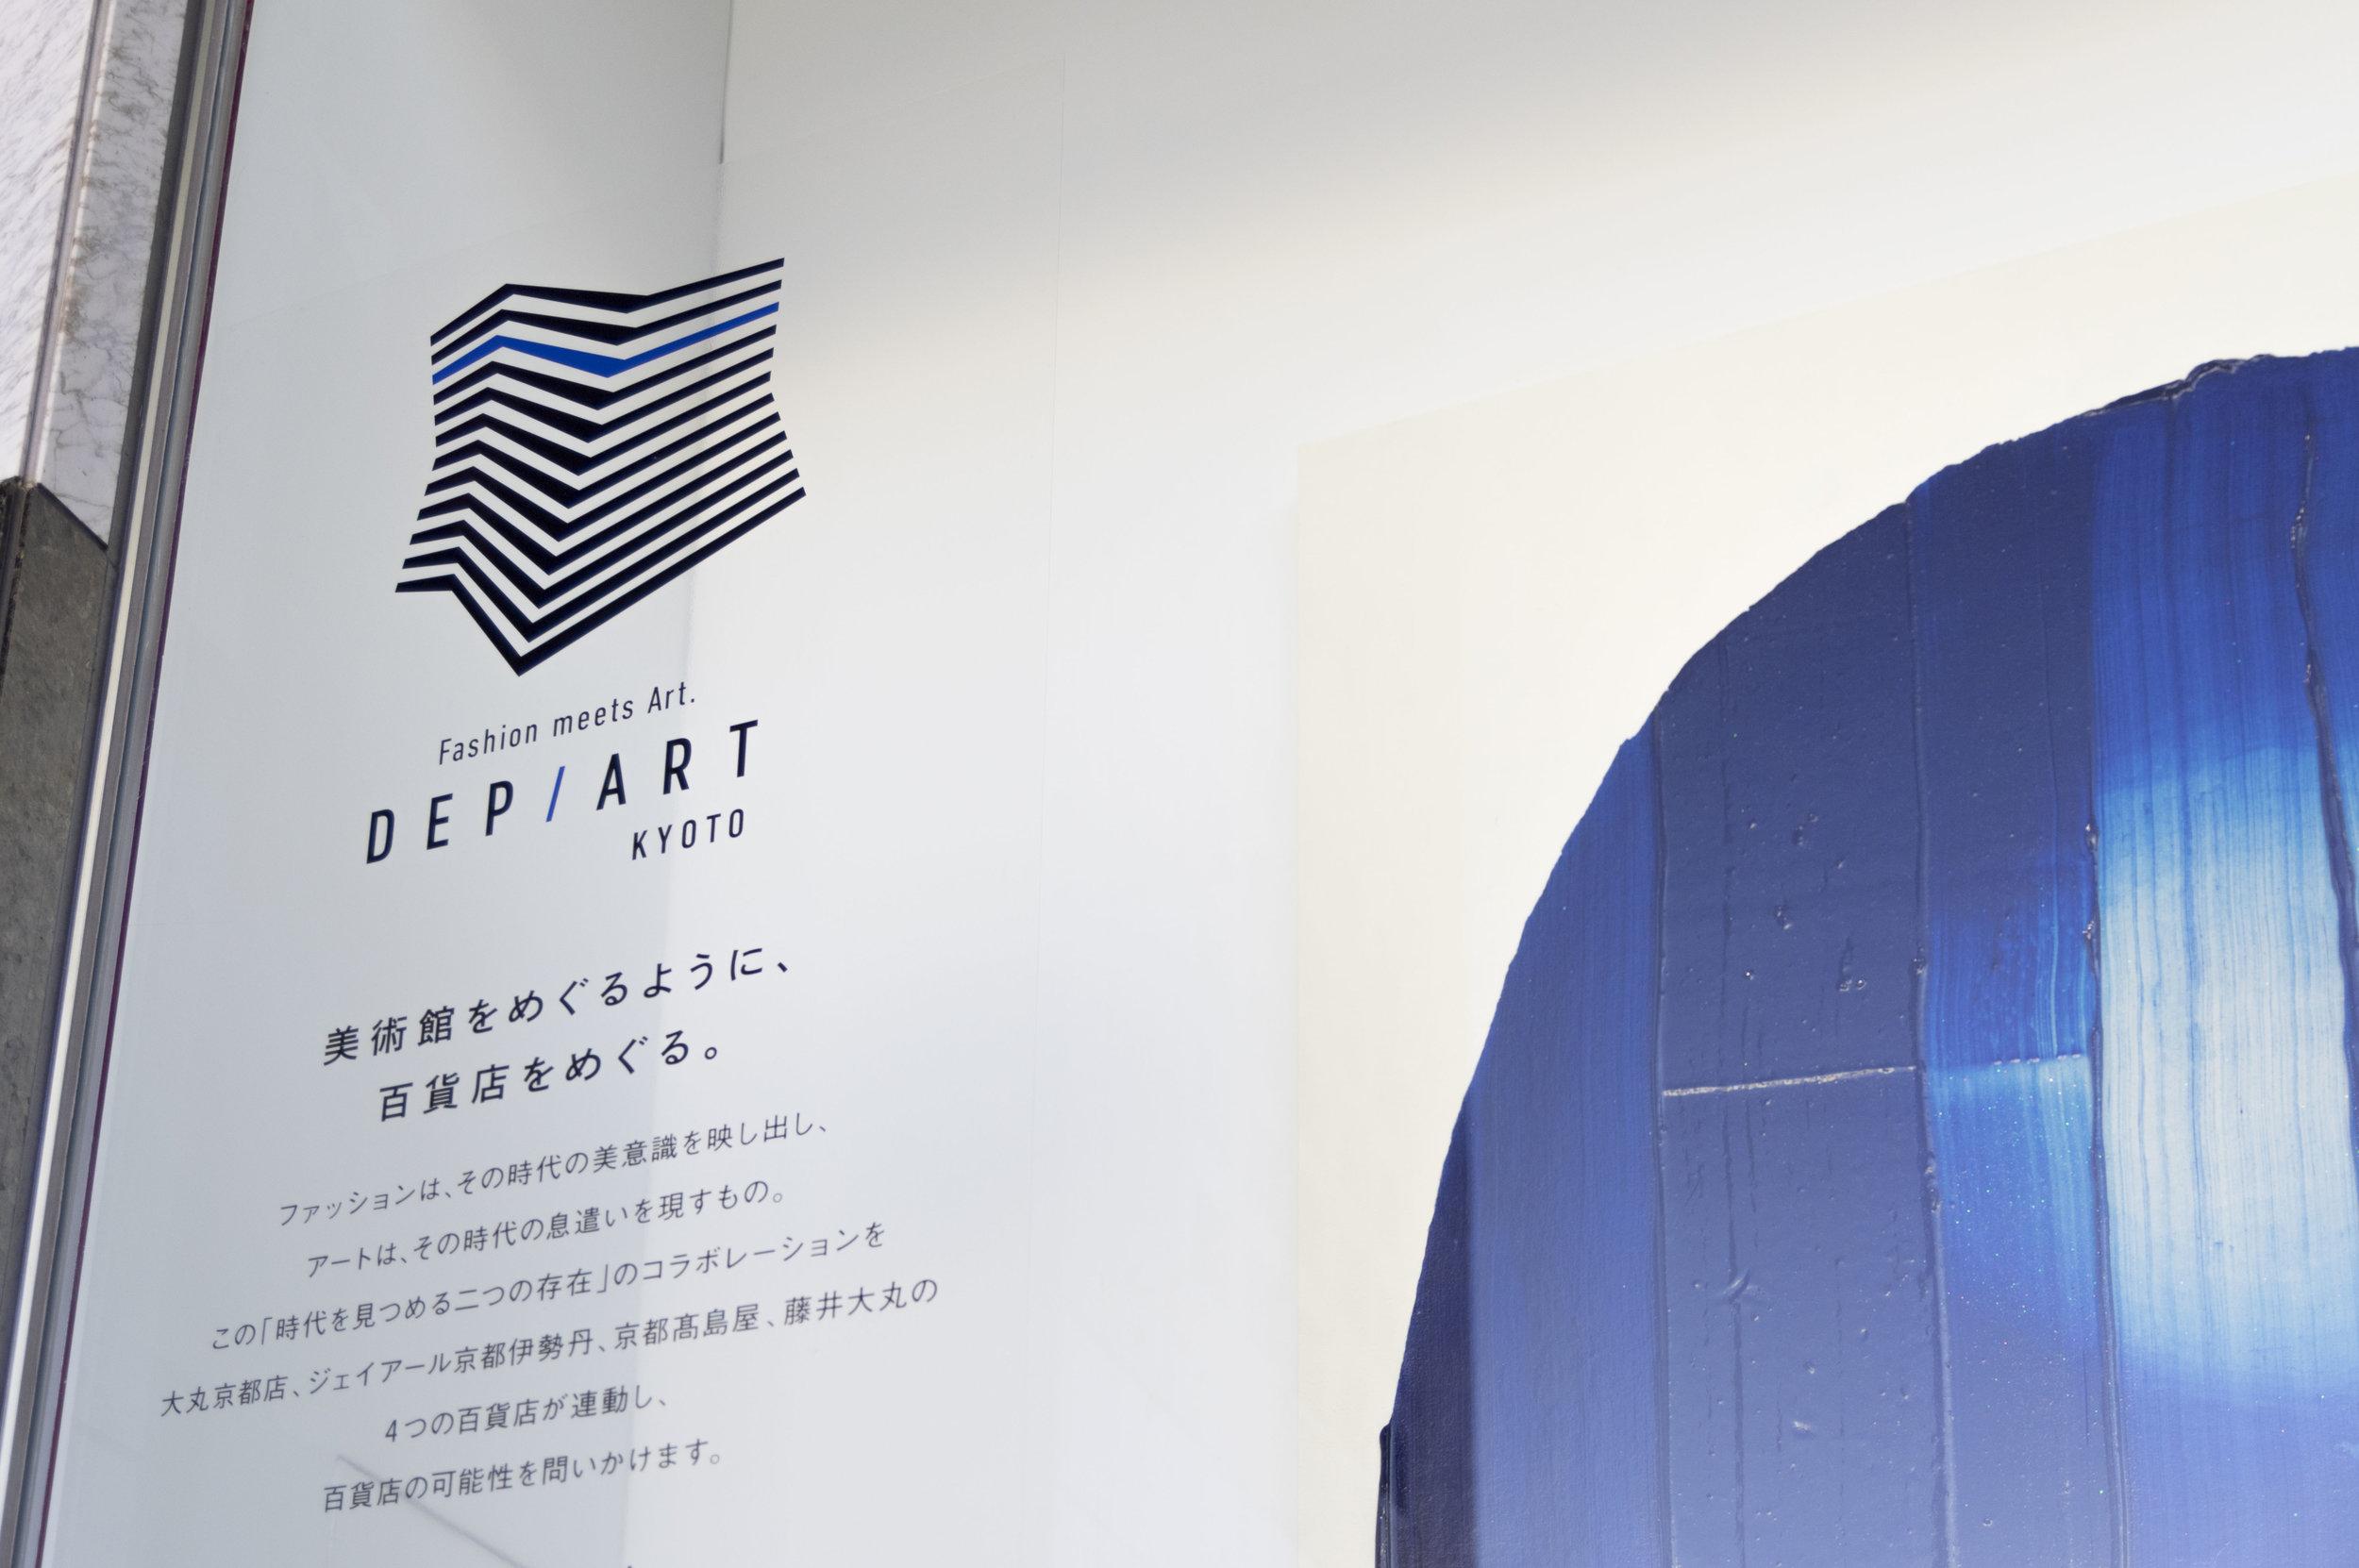 DEP/ART KYOTO